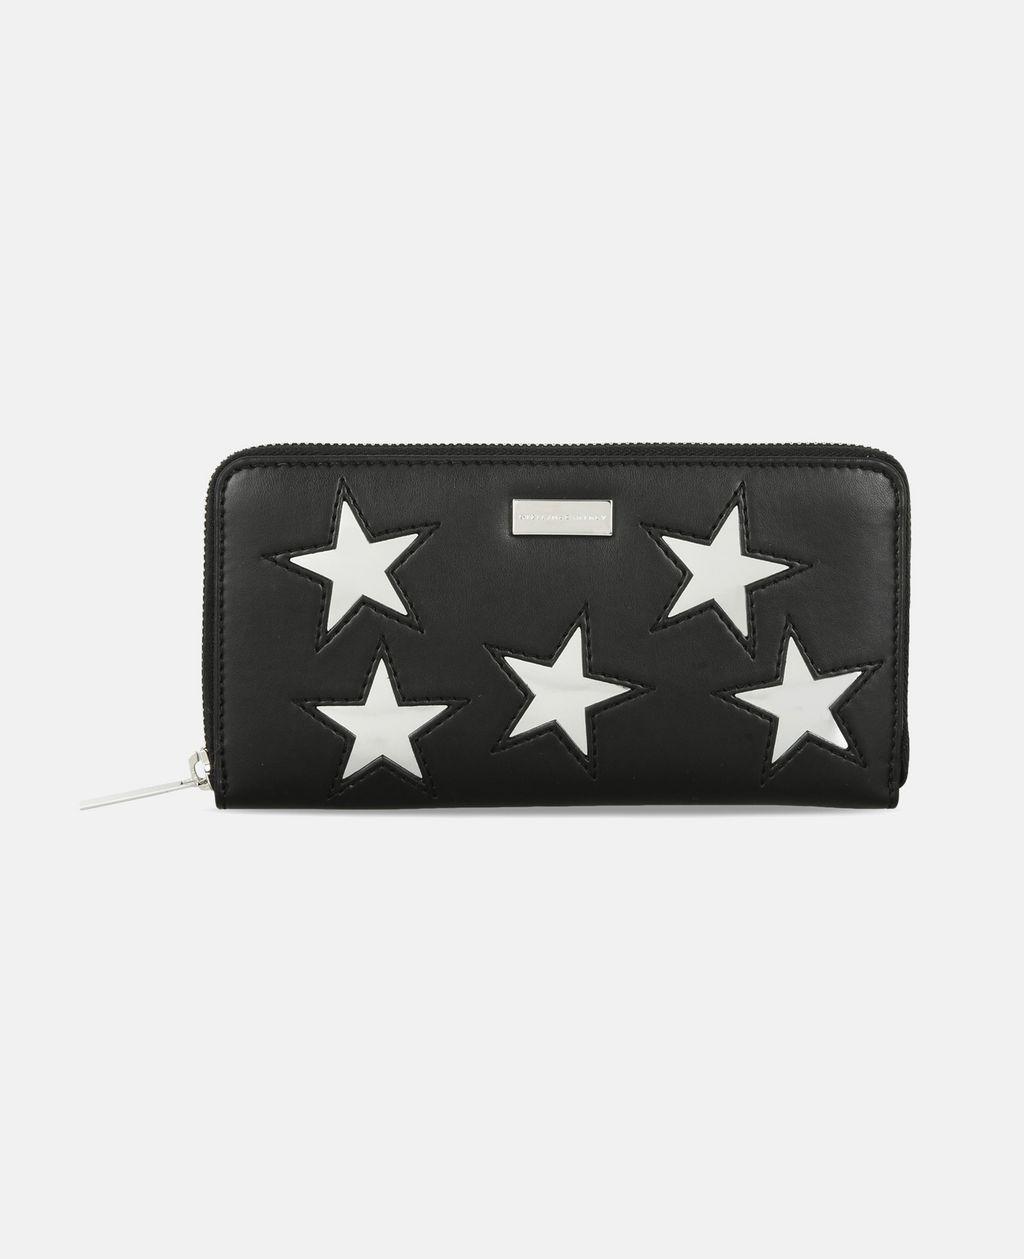 Black Metallic Stars Zip Wallet - STELLA MCCARTNEY